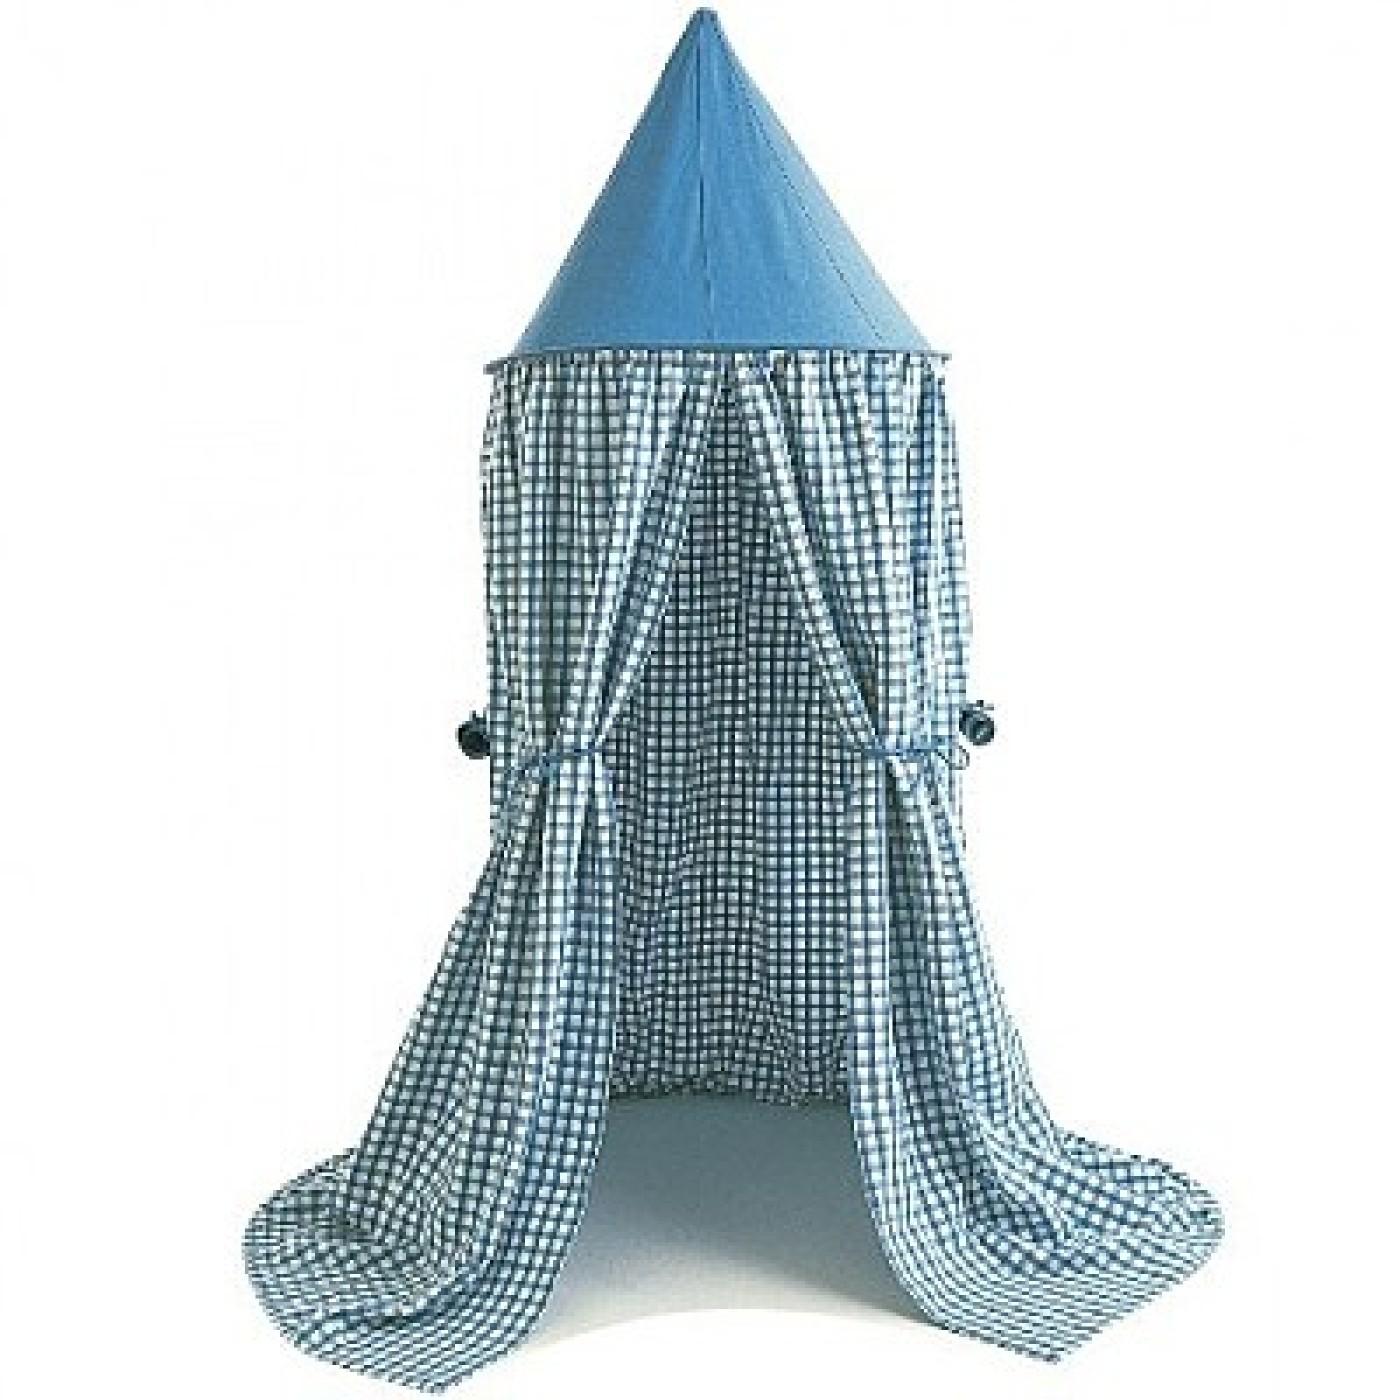 Hanging Tent Sky Blue Gingham